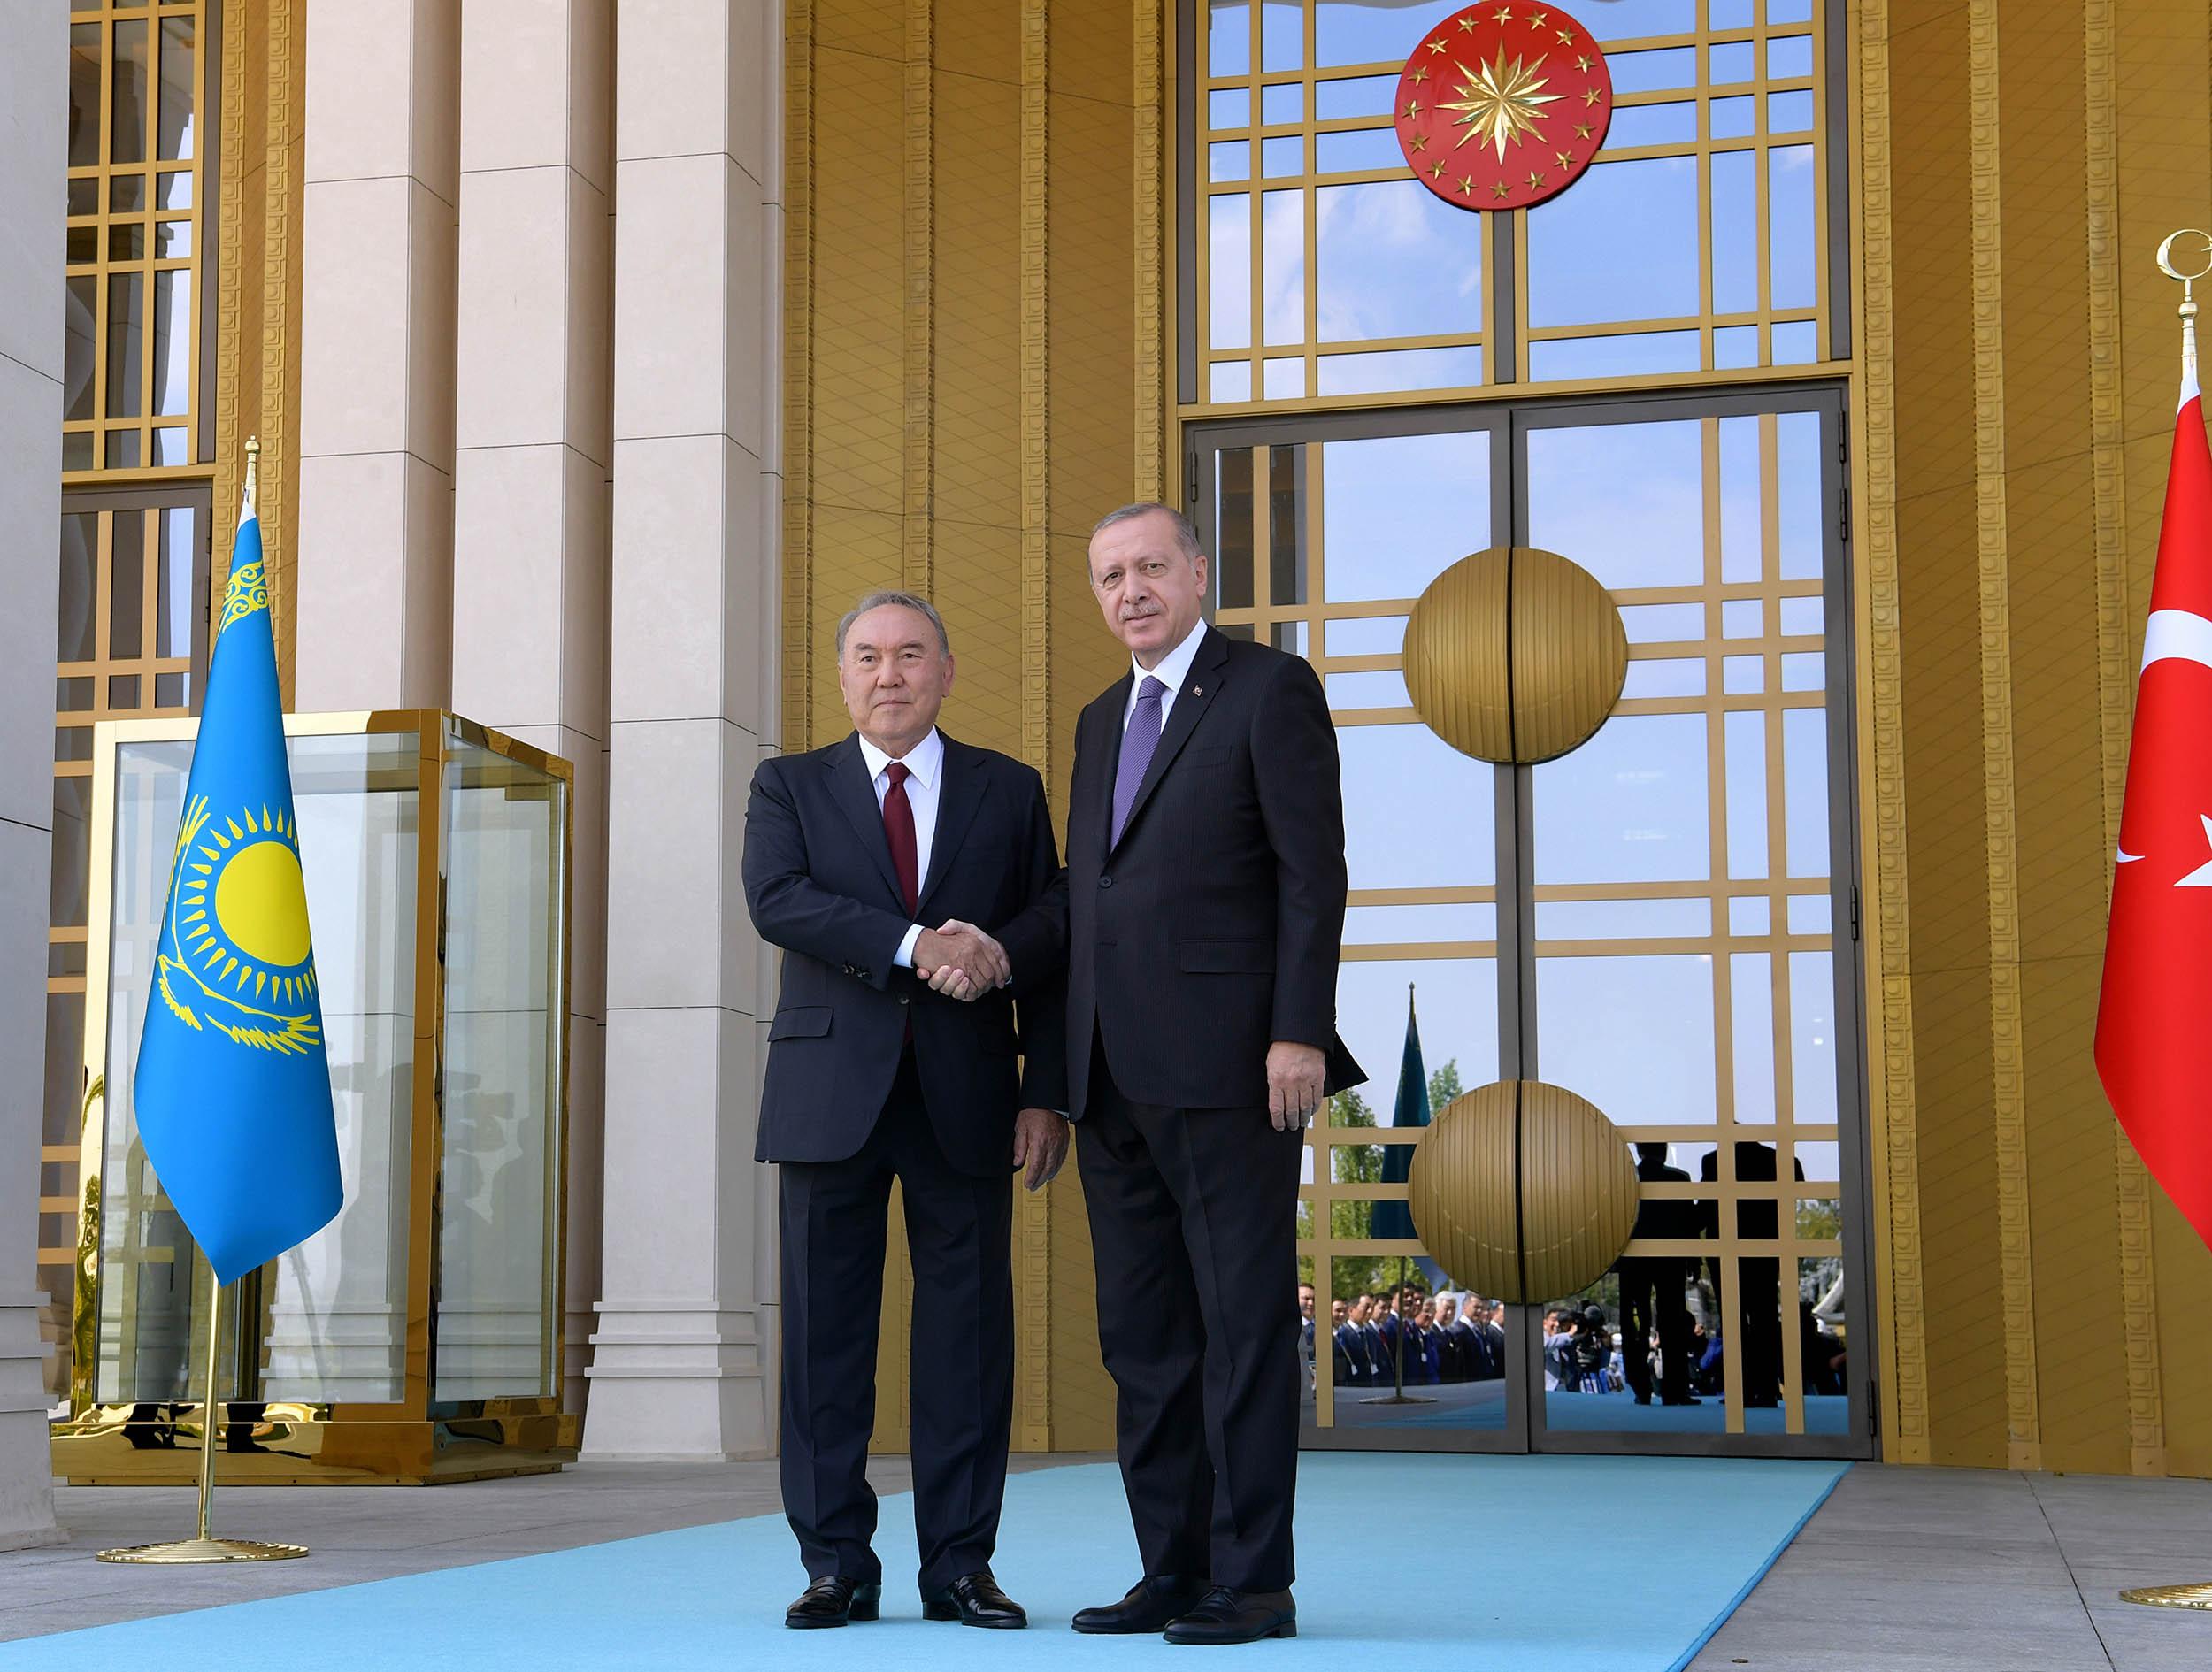 Нұрсұлтан Назарбаев пен Режеп Тайип Ердоған